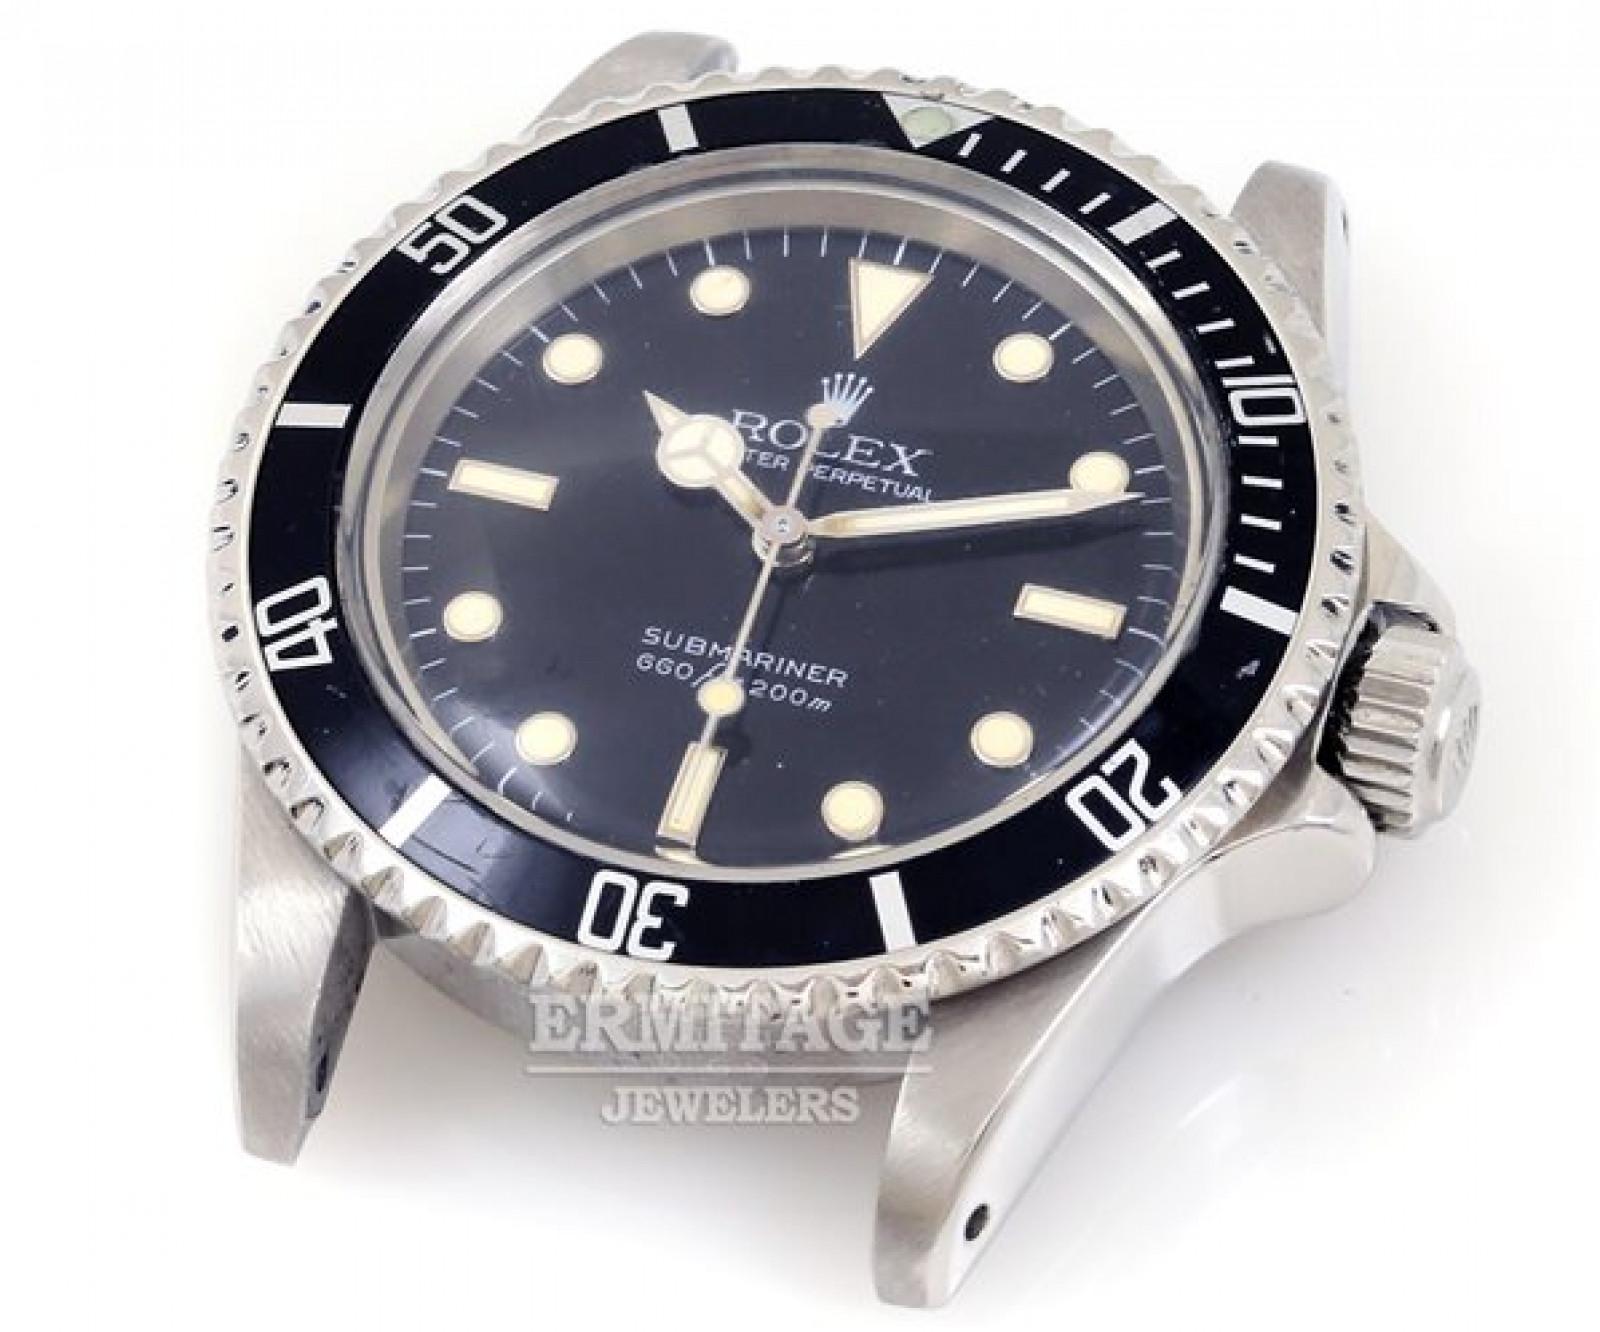 Vintage Rolex Submariner 5513 Steel with Black Dial